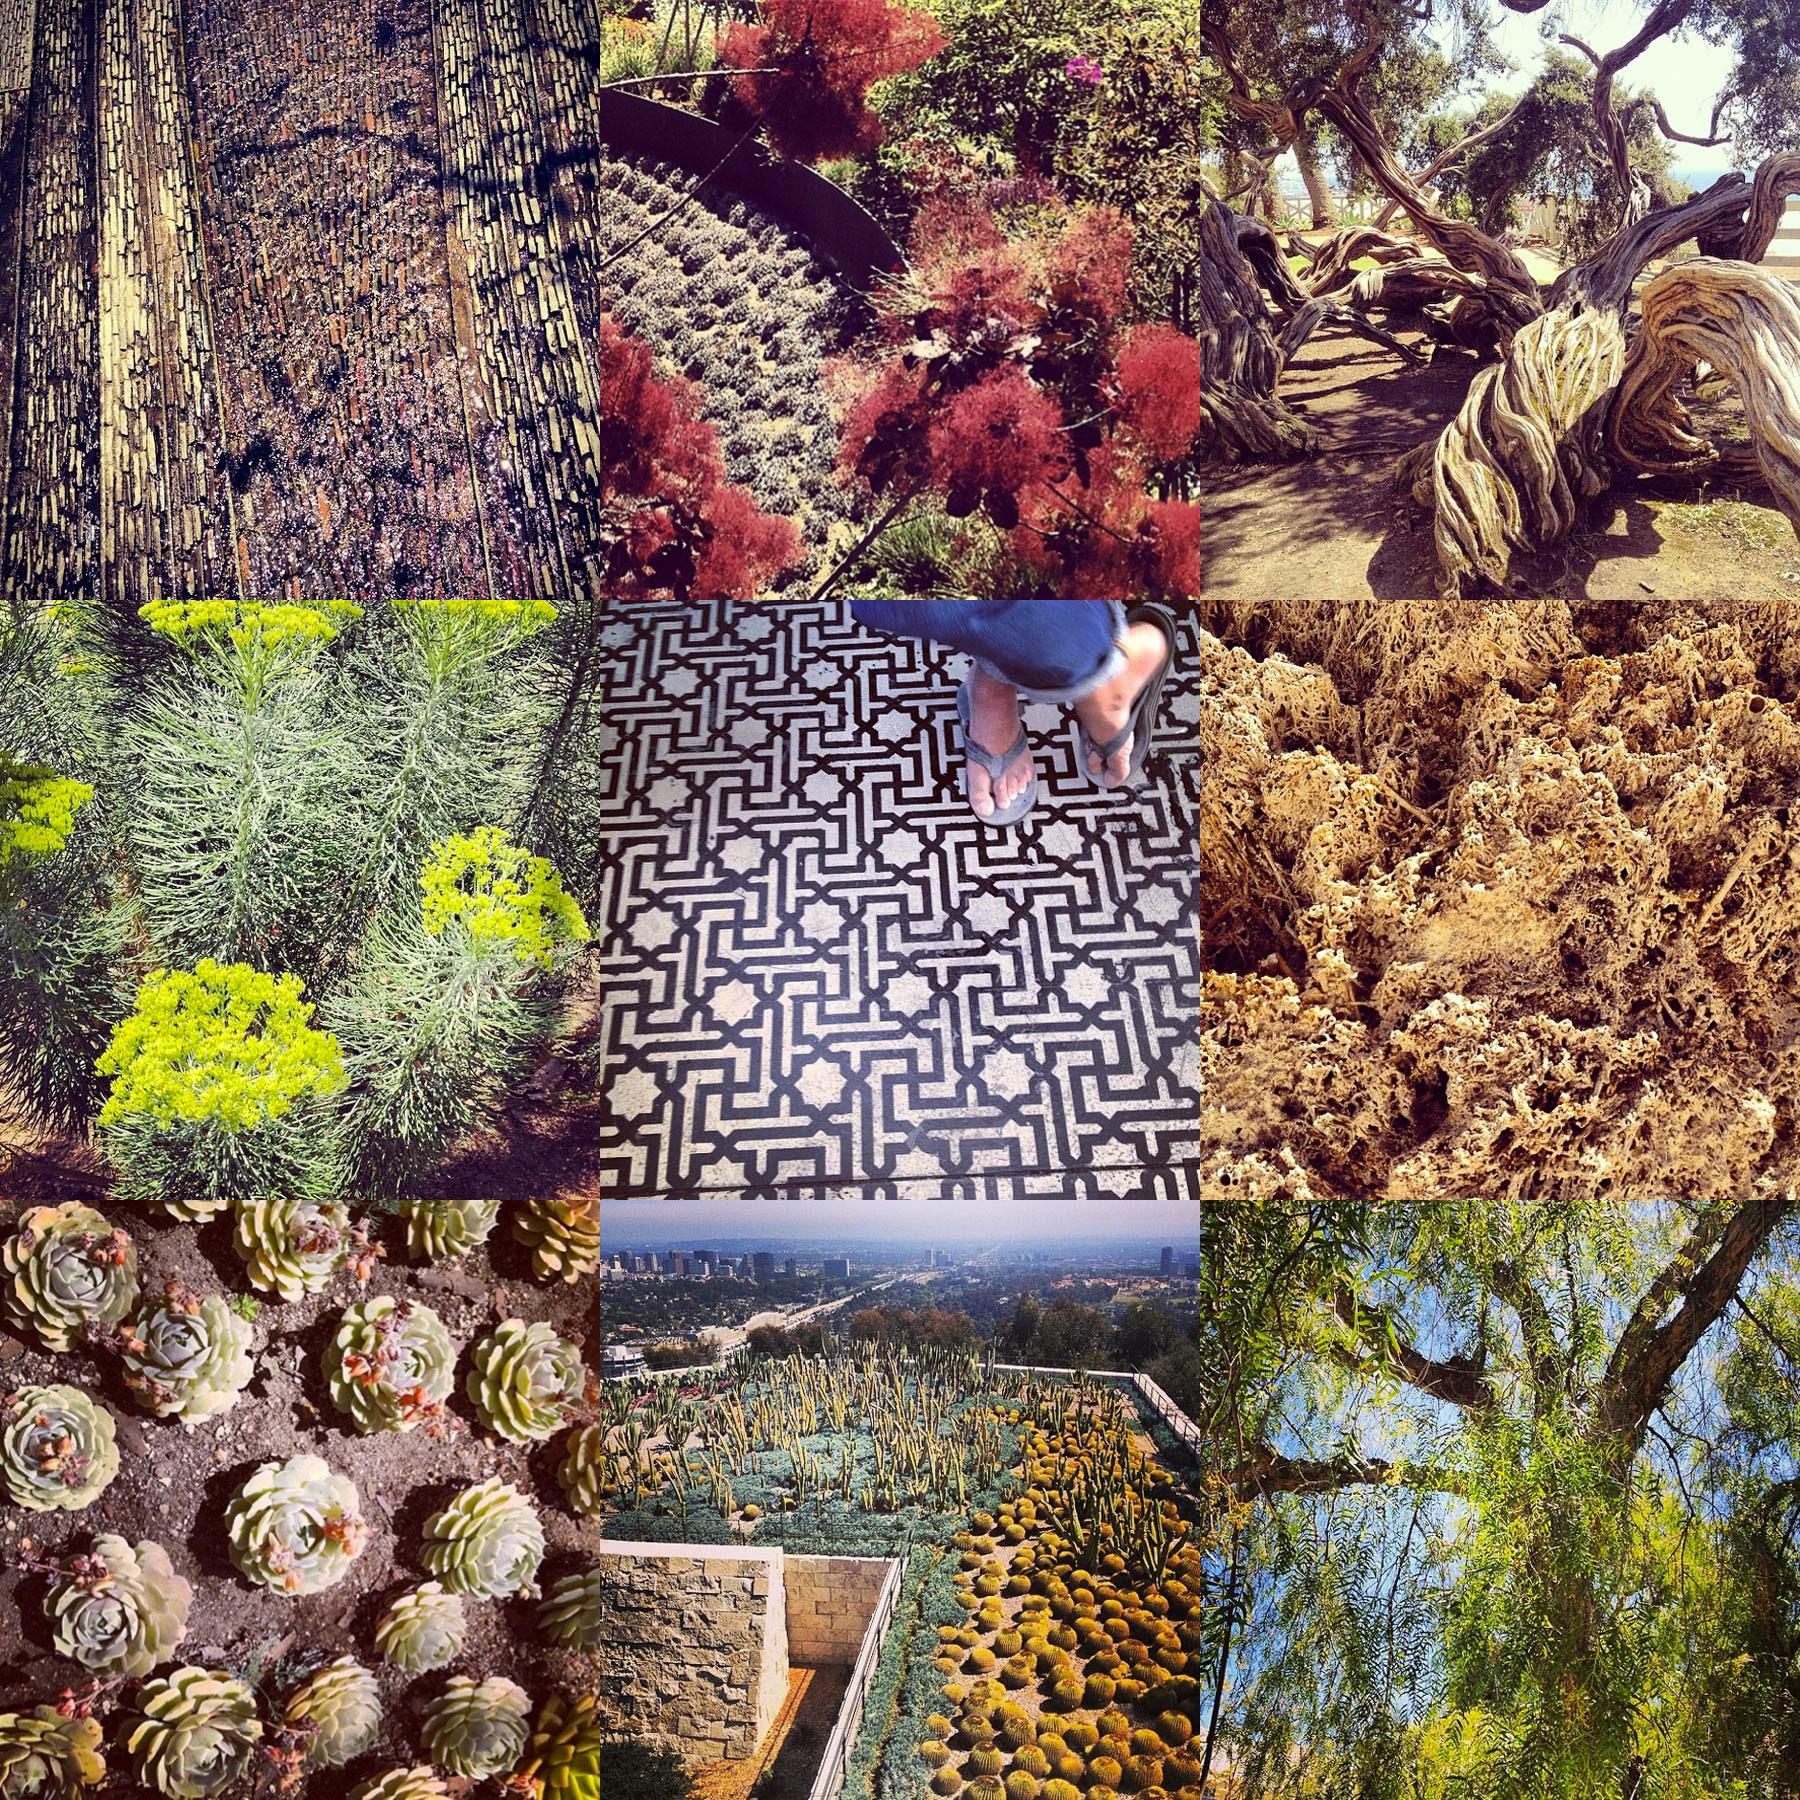 LA Inspiration, a collage by Liz Nehdi